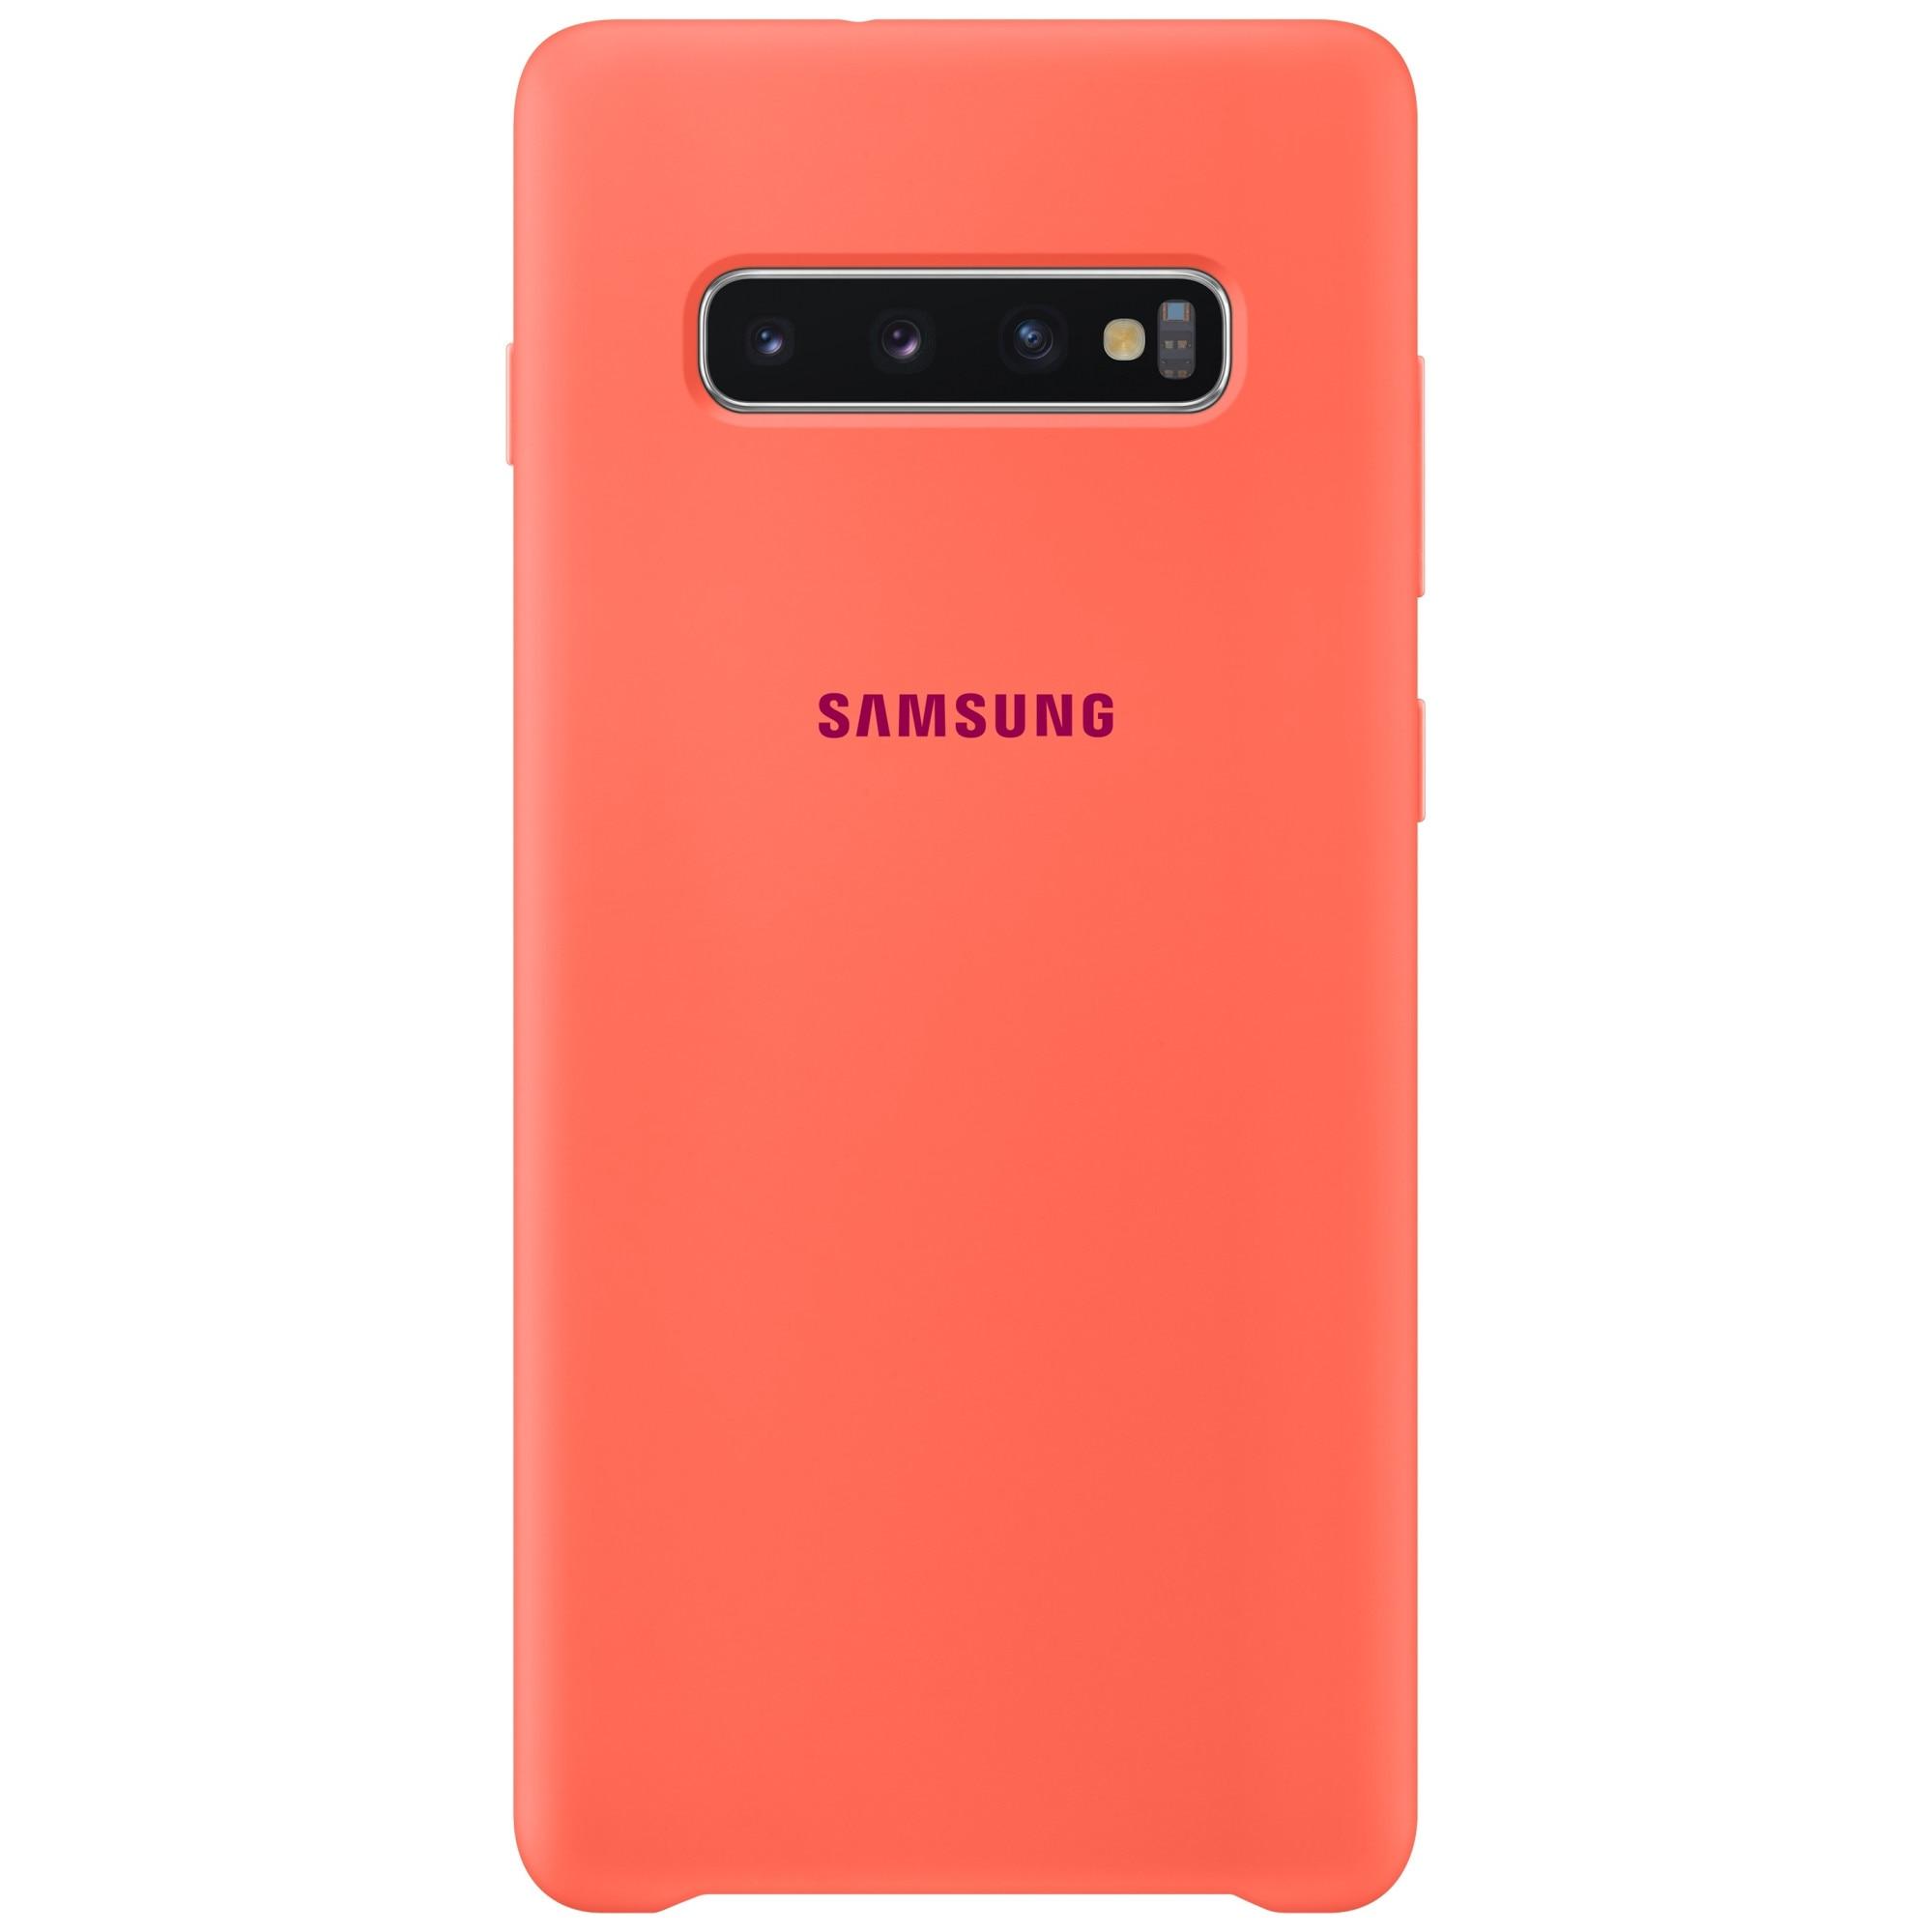 Fotografie Husa de protectie Samsung Silicone pentru Galaxy S10 Plus G975, Berry Pink